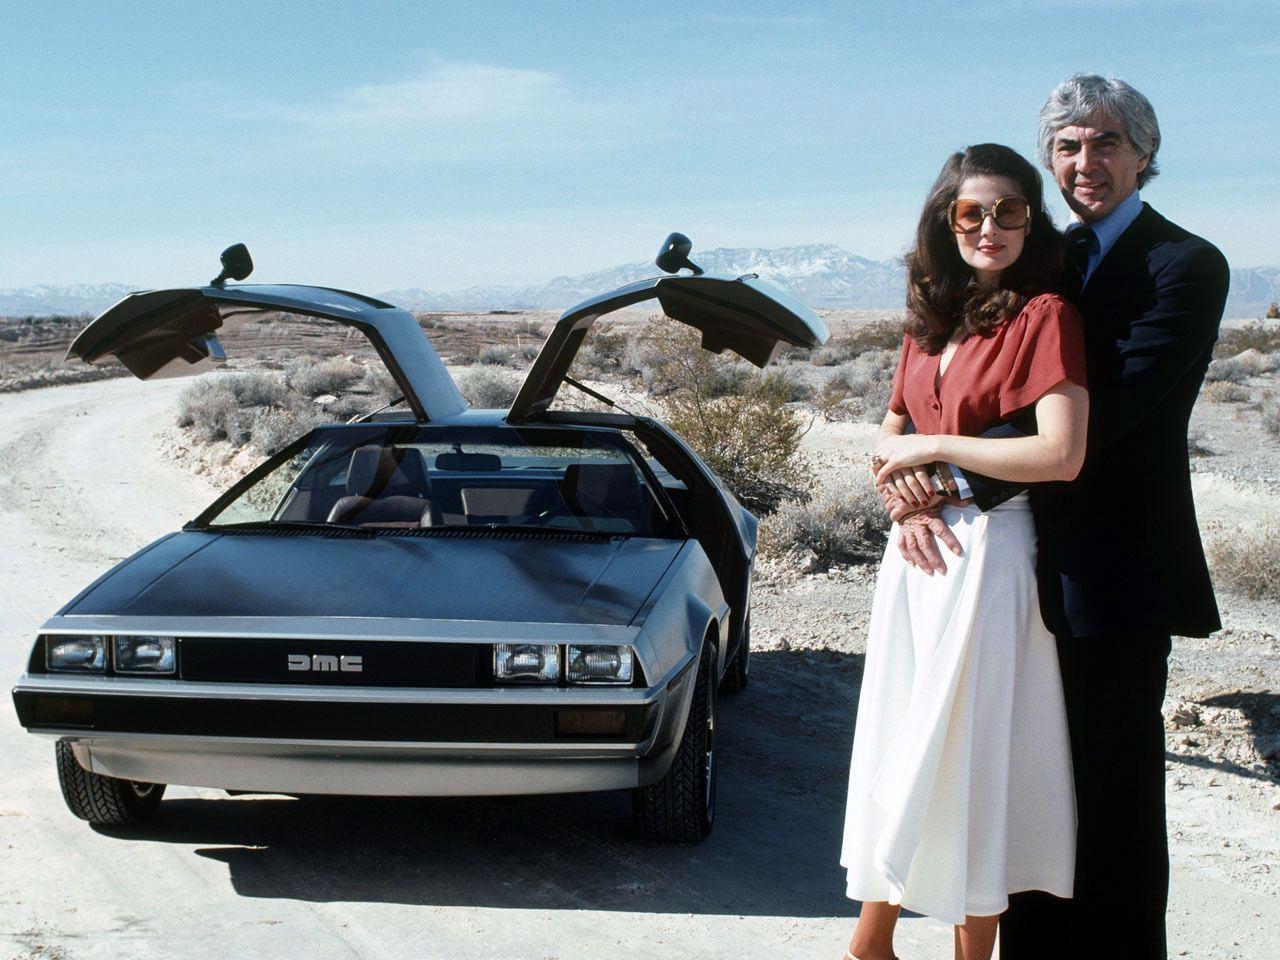 Documentary: Car Crash - The DeLorean Story